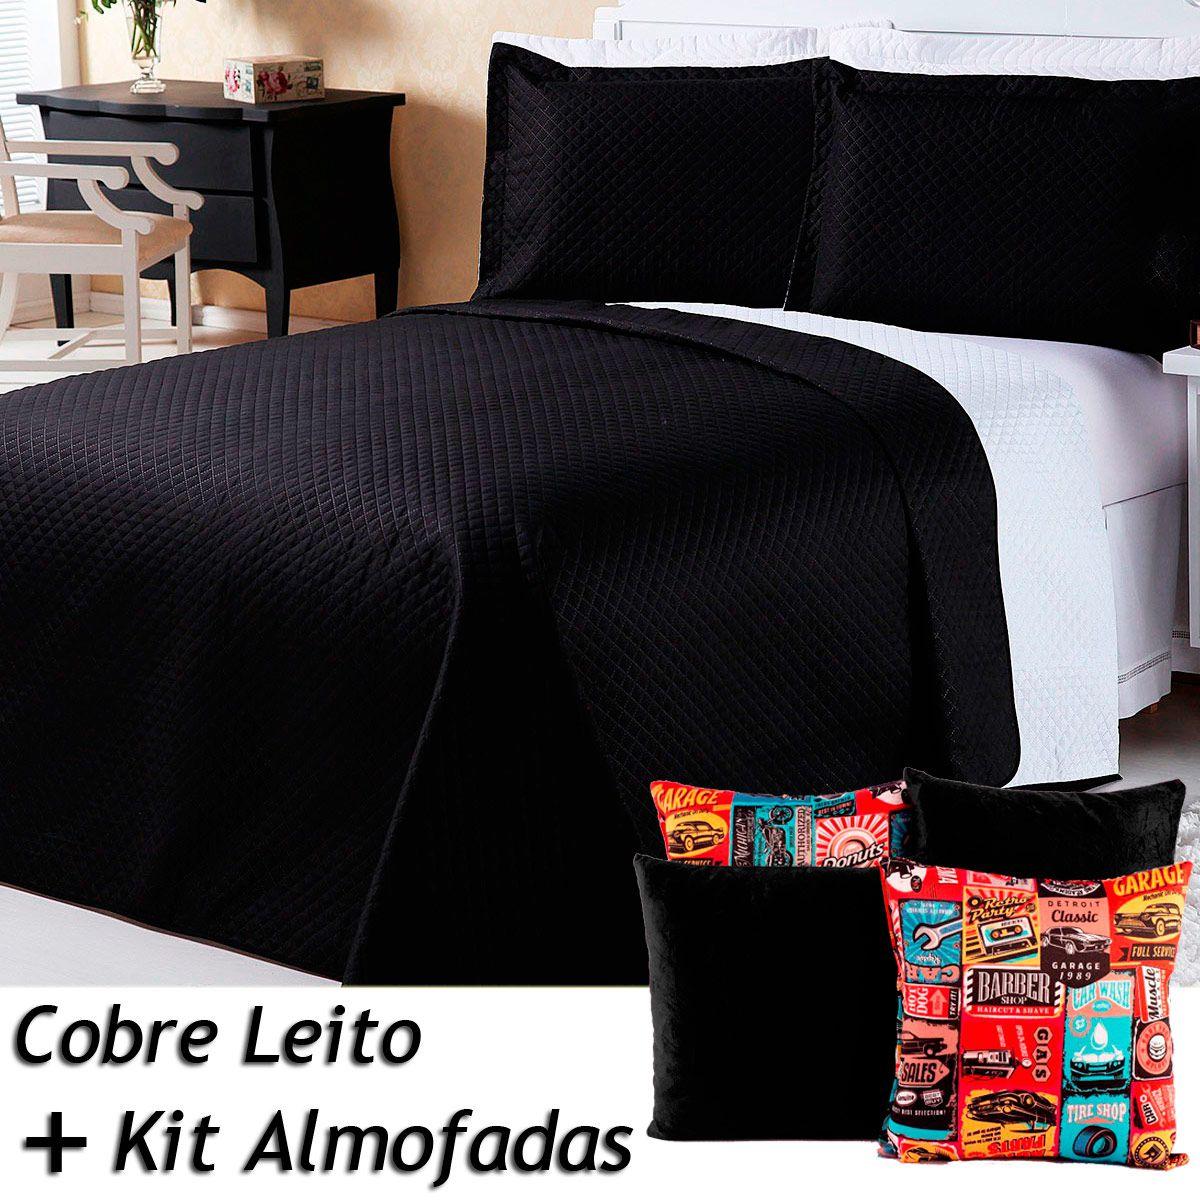 Kit Cobre Leito c/ 4 Almofadas Cheias Dual Color Preto/Branco Dupla Face Queen 07 Peças